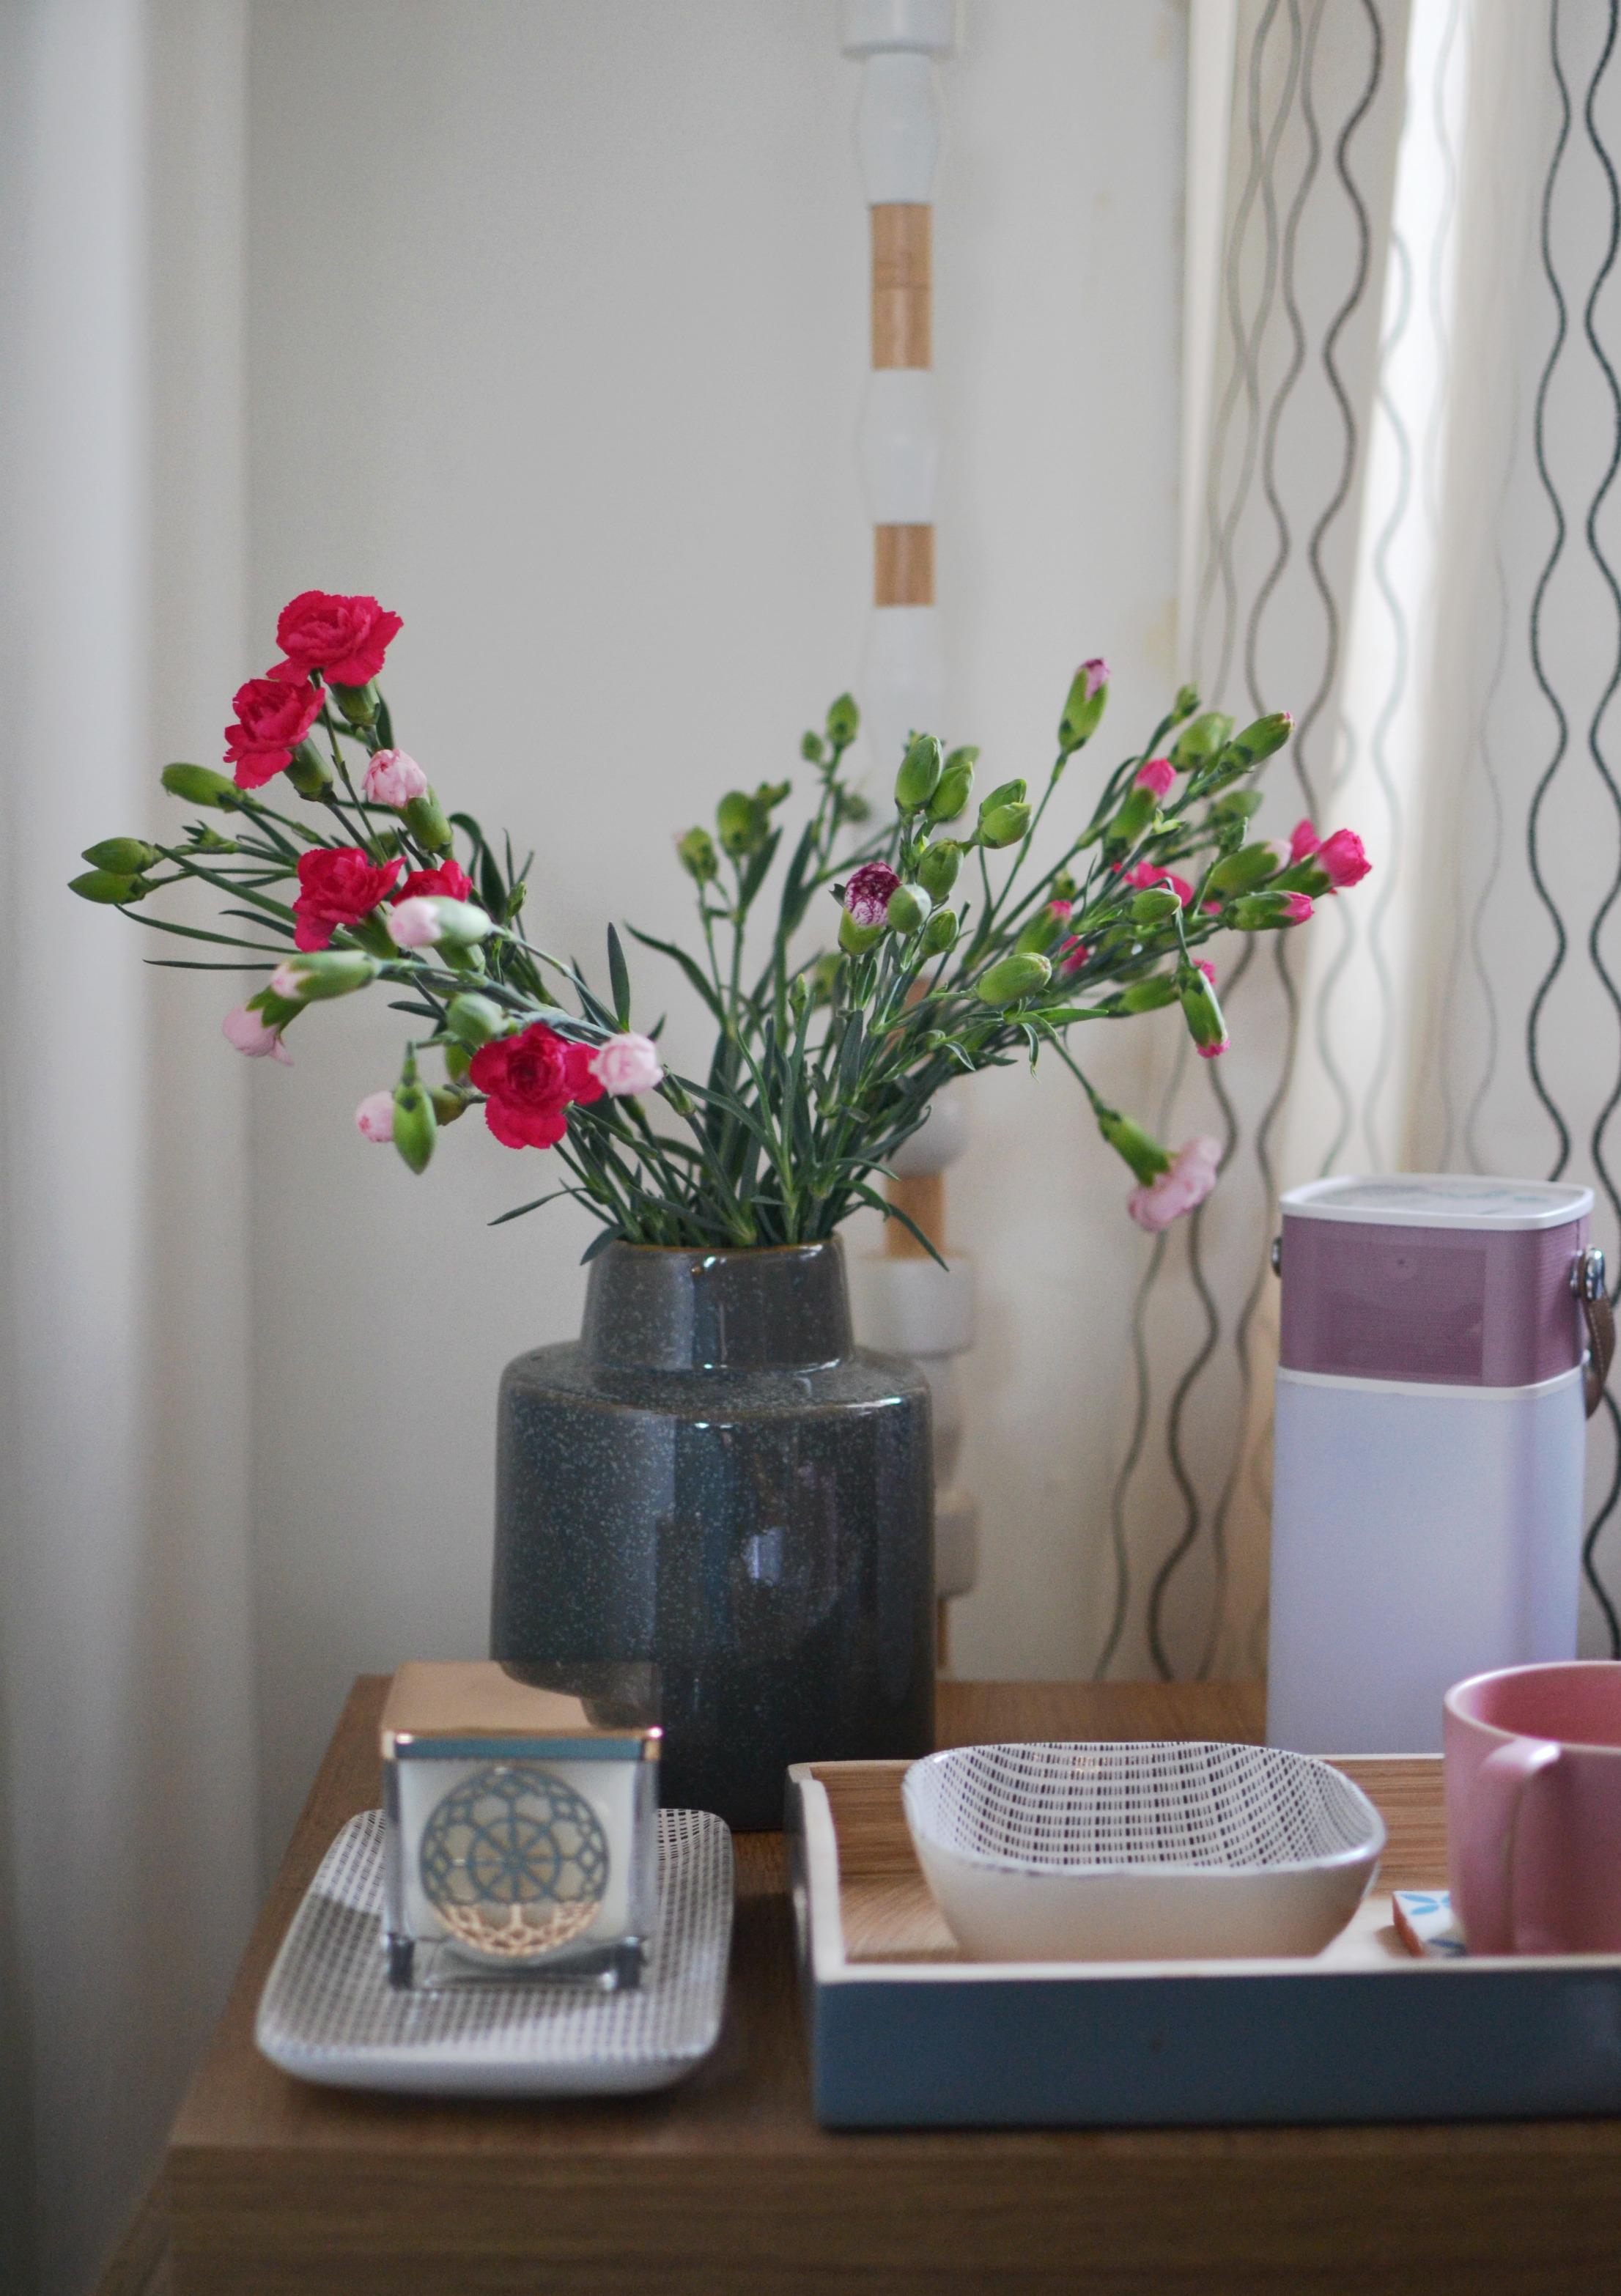 Home interiors blogger